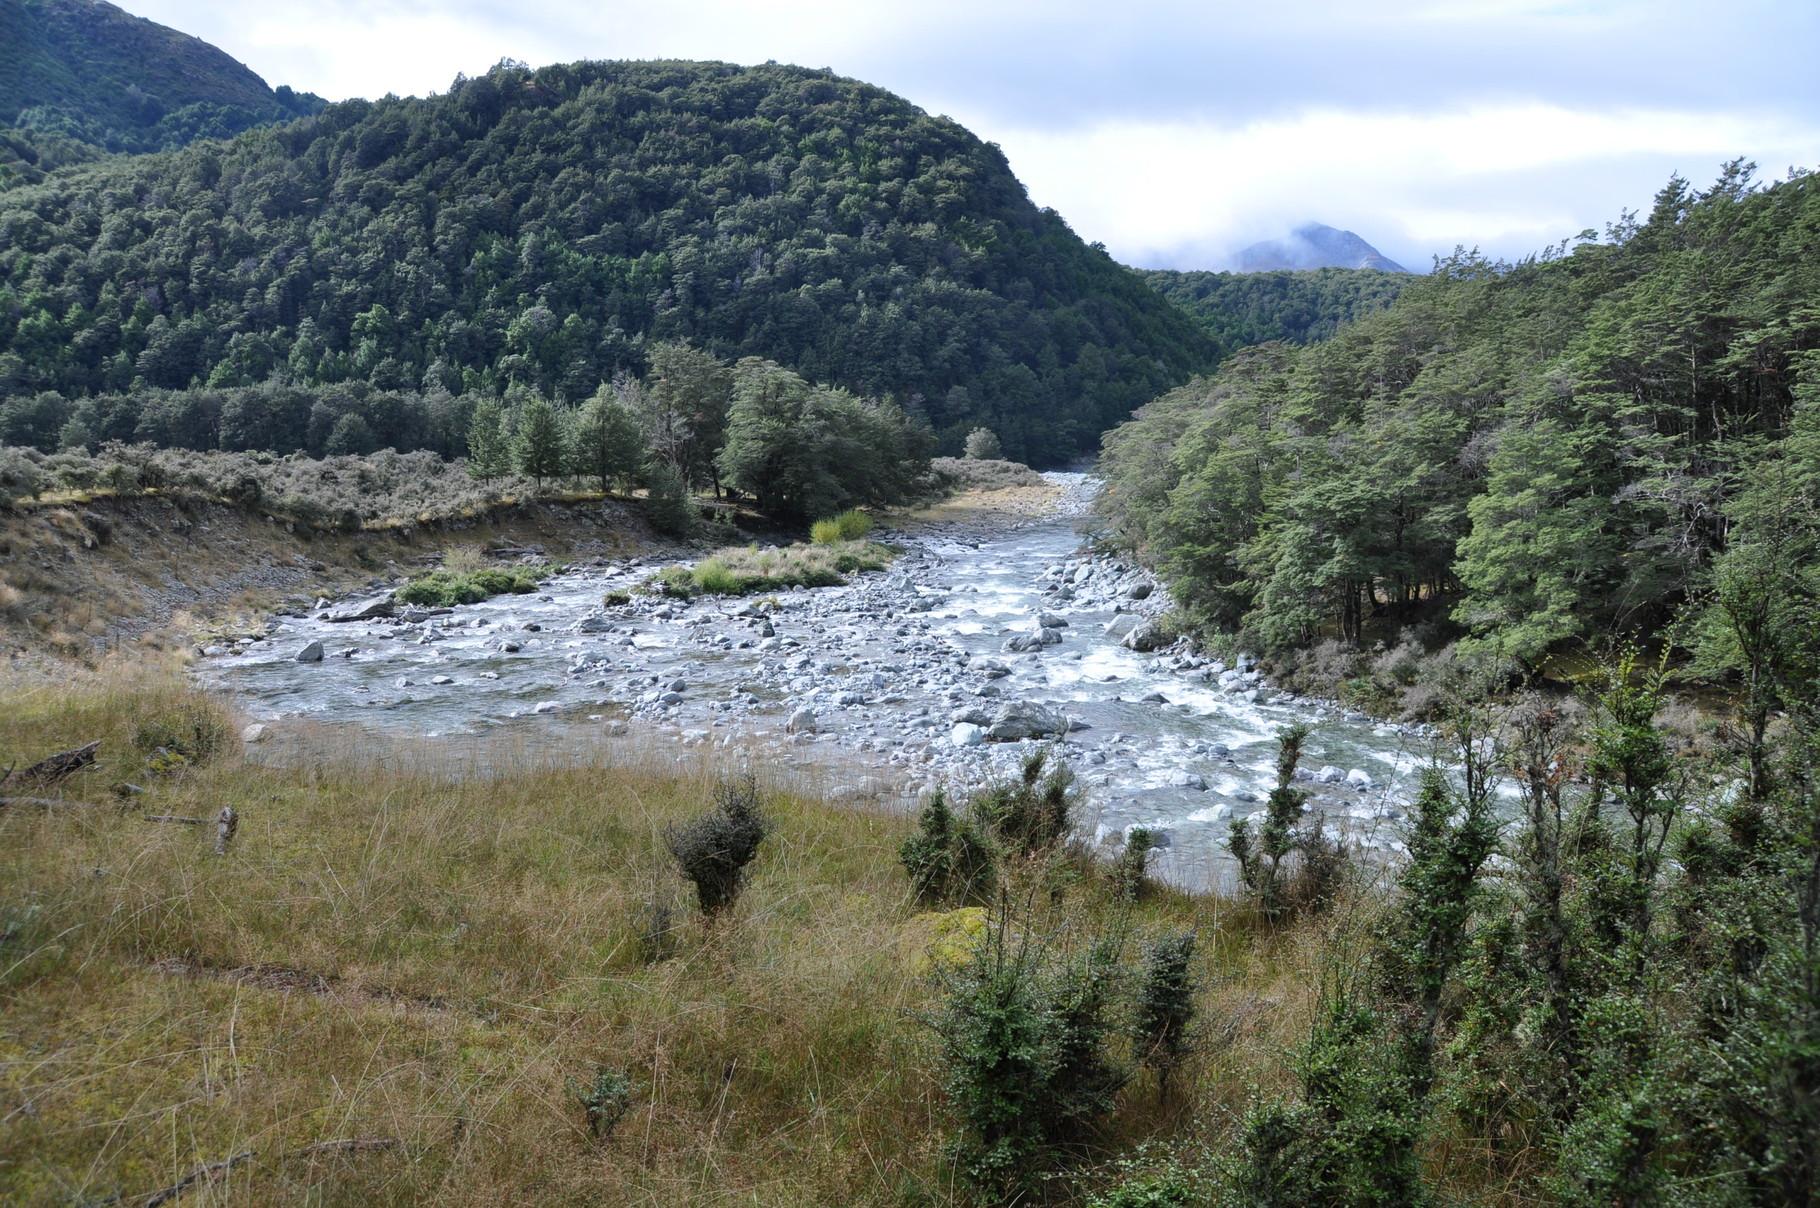 Wanderung bei Glenorchy